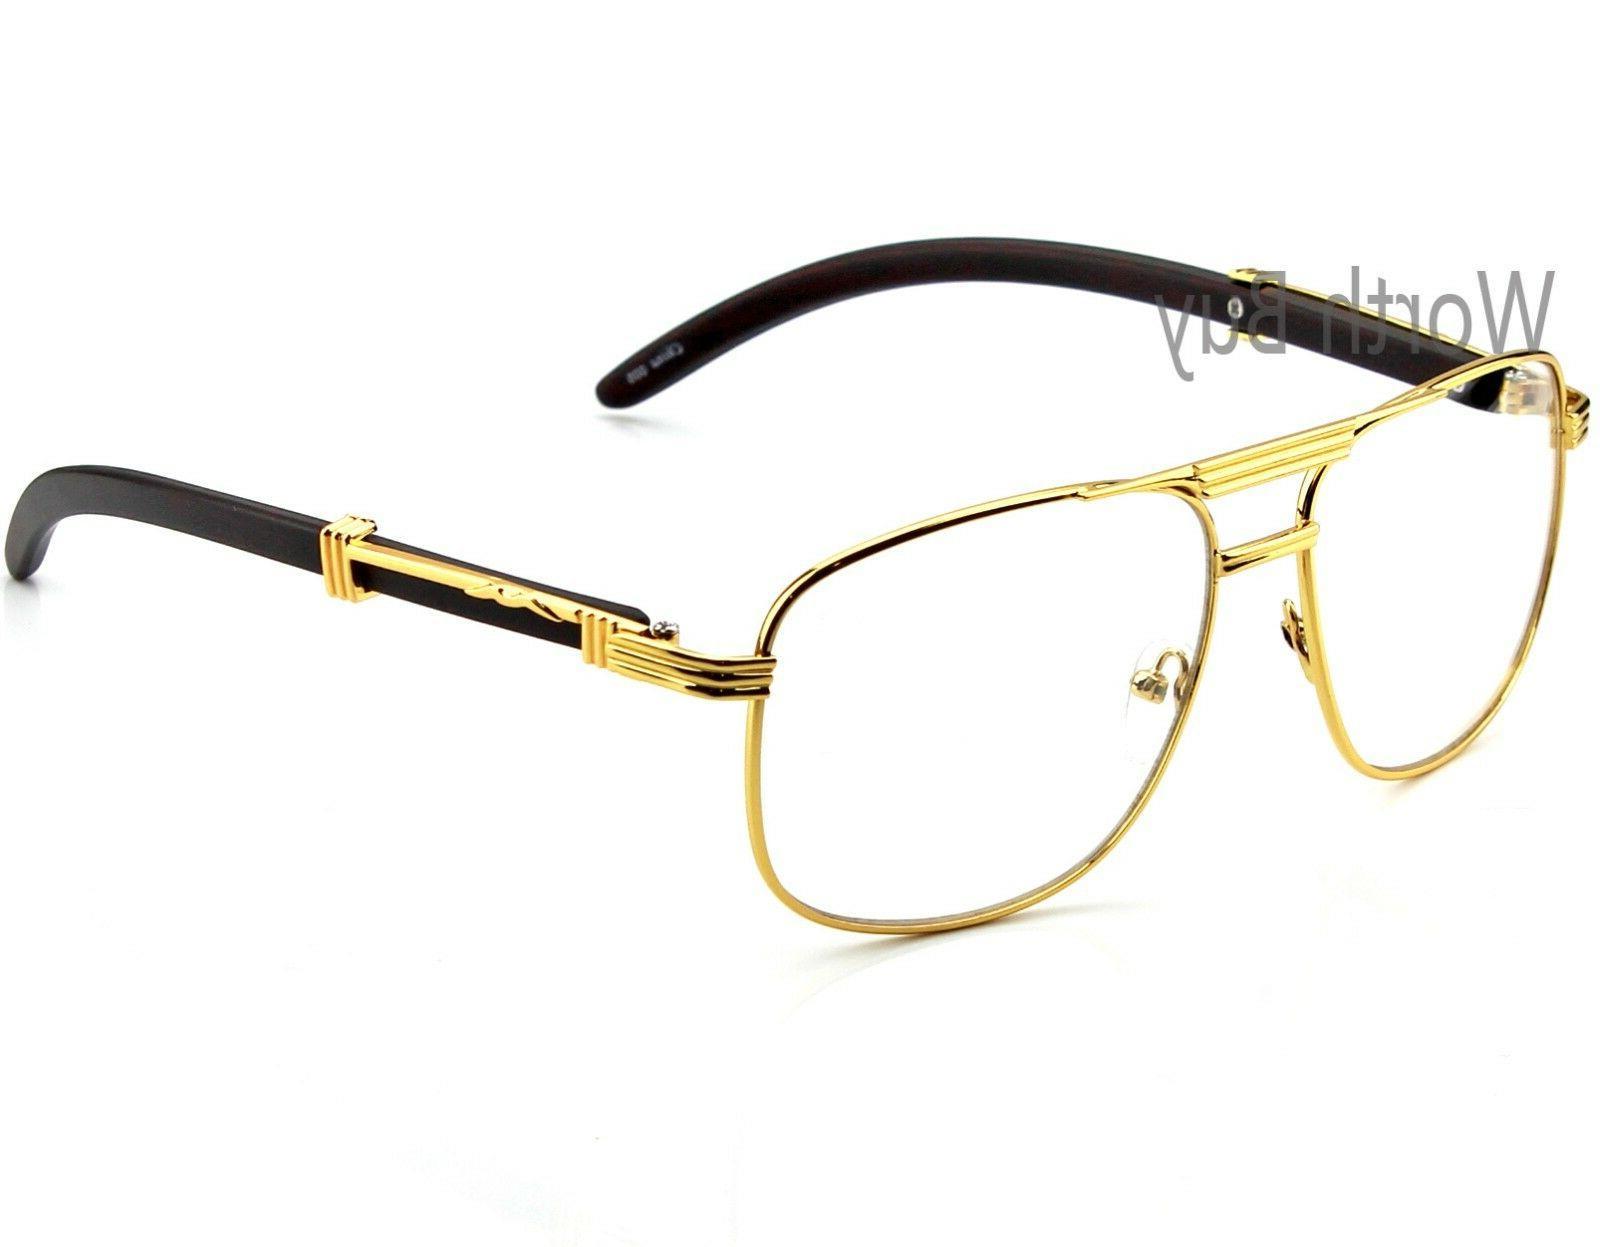 Mens Women Pilot Clear Lens Fashion Eye Glasses Retro RX Gol